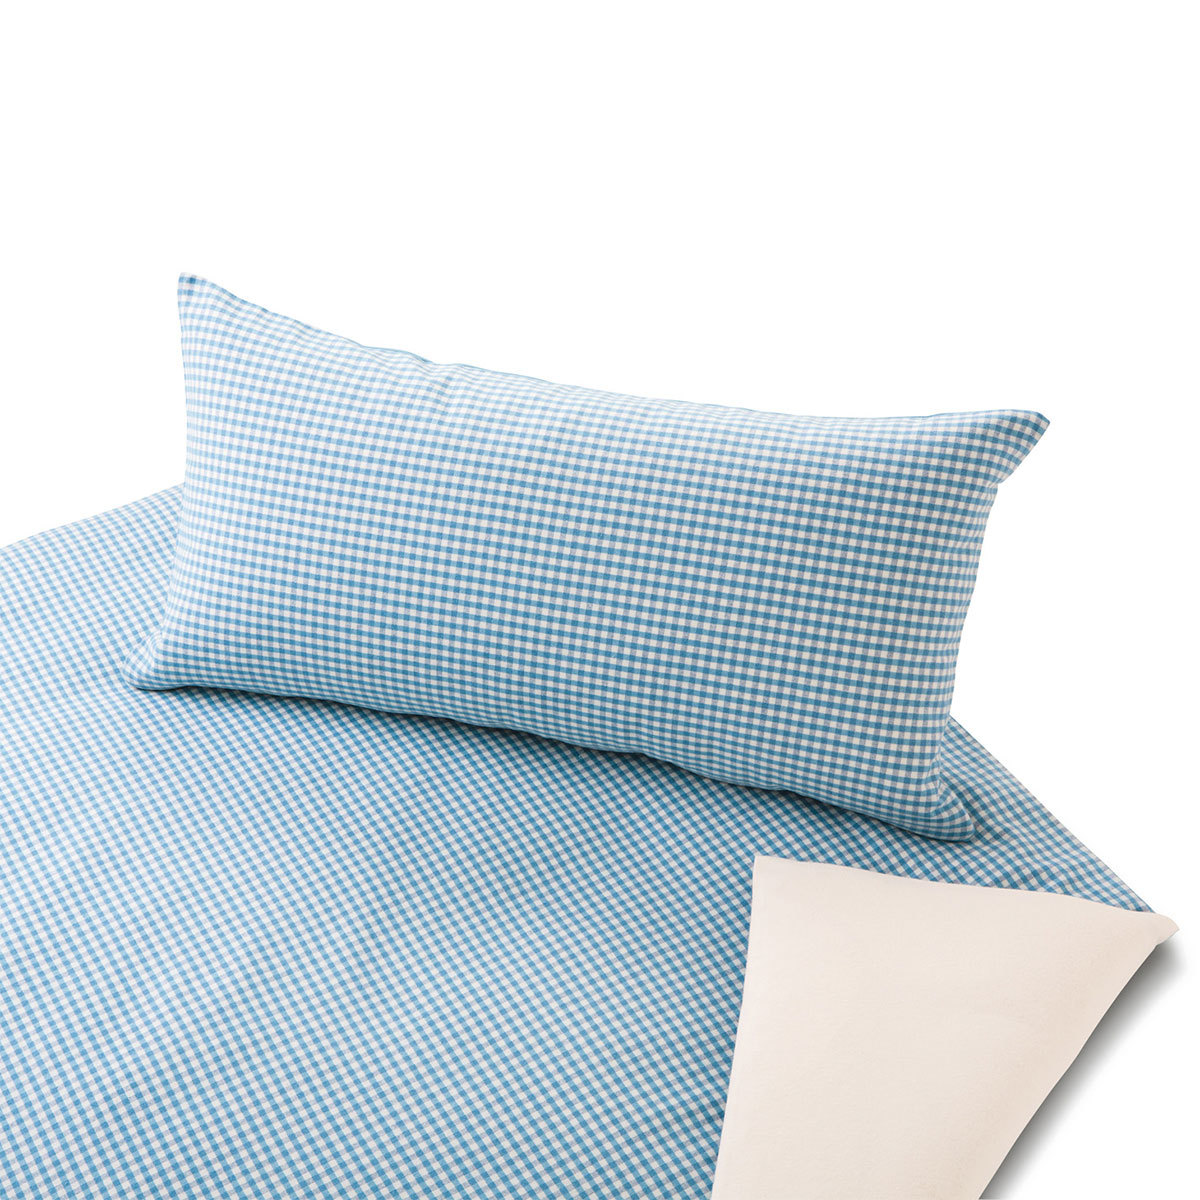 cotonea edel biber wendebettw sche vichy t rkis g nstig online kaufen bei bettwaren shop. Black Bedroom Furniture Sets. Home Design Ideas